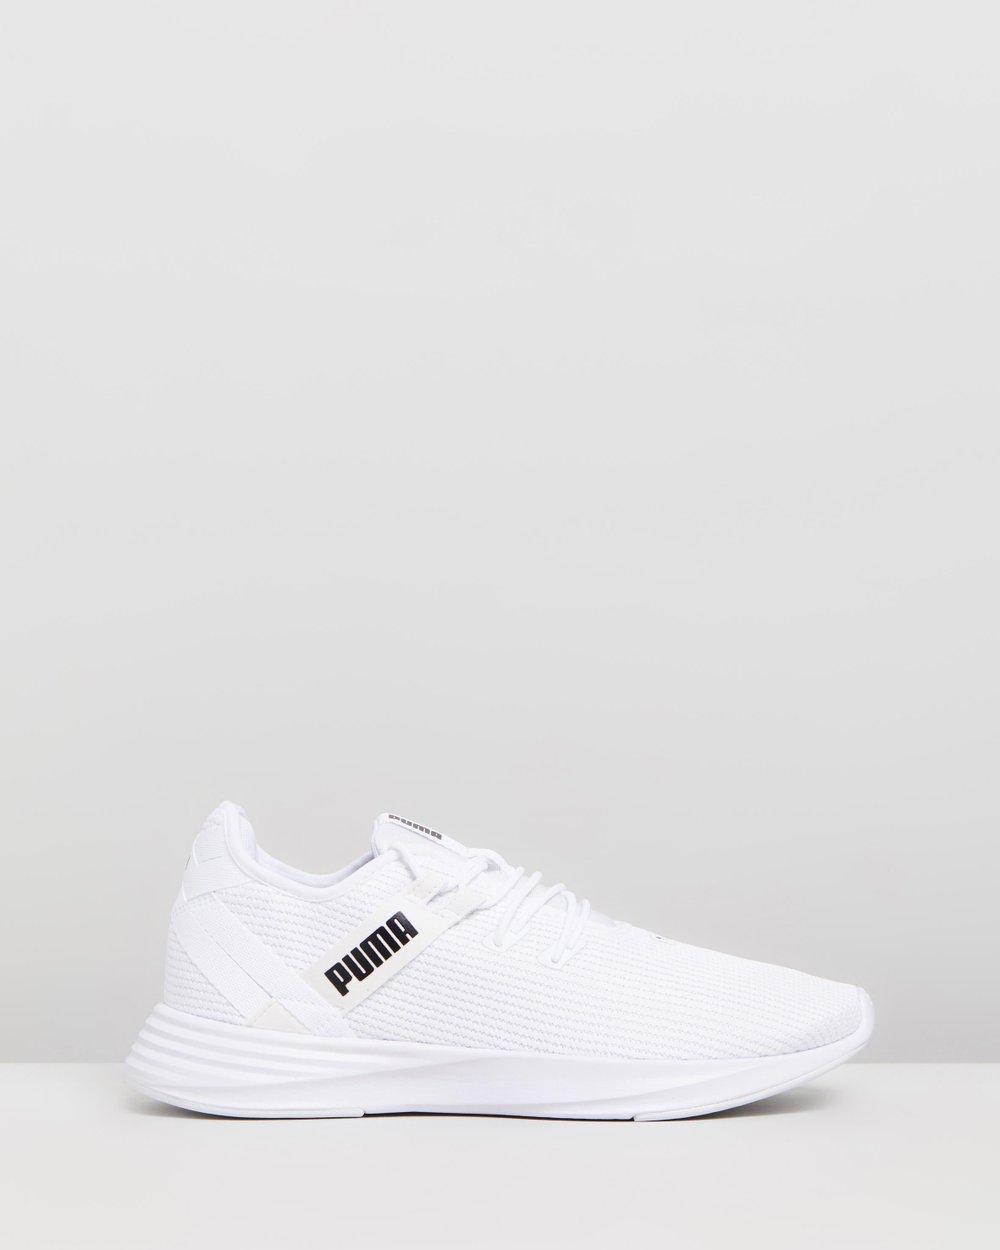 87ce86e38e8fb2 Radiate XT Shoes - Women s by Puma Online